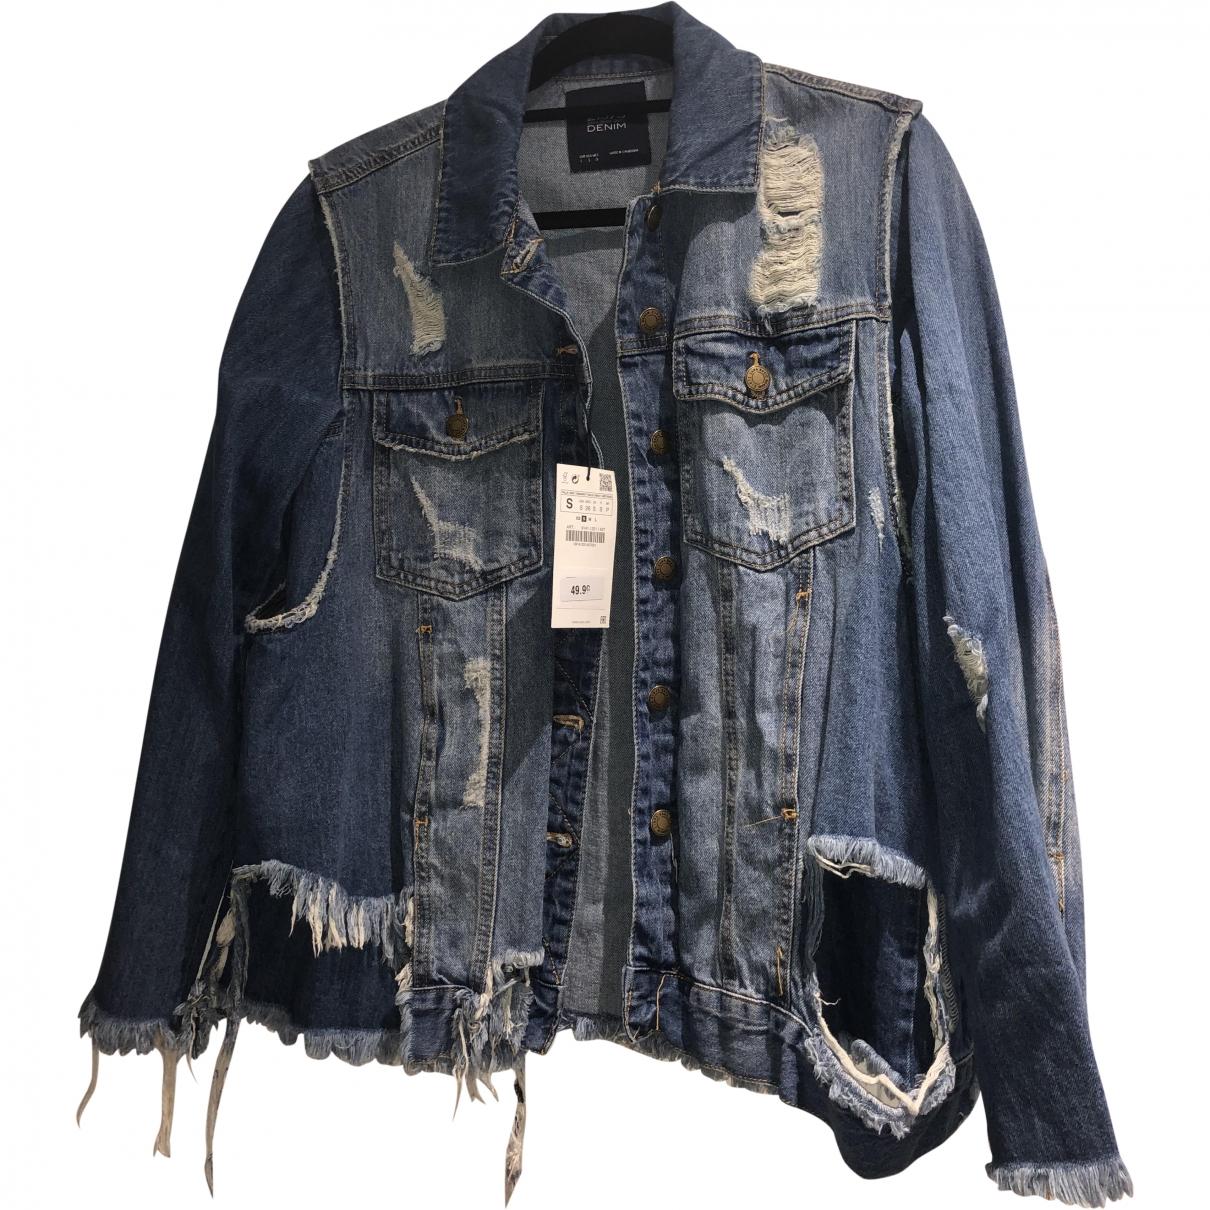 Zara \N Blue Denim - Jeans jacket for Women S International